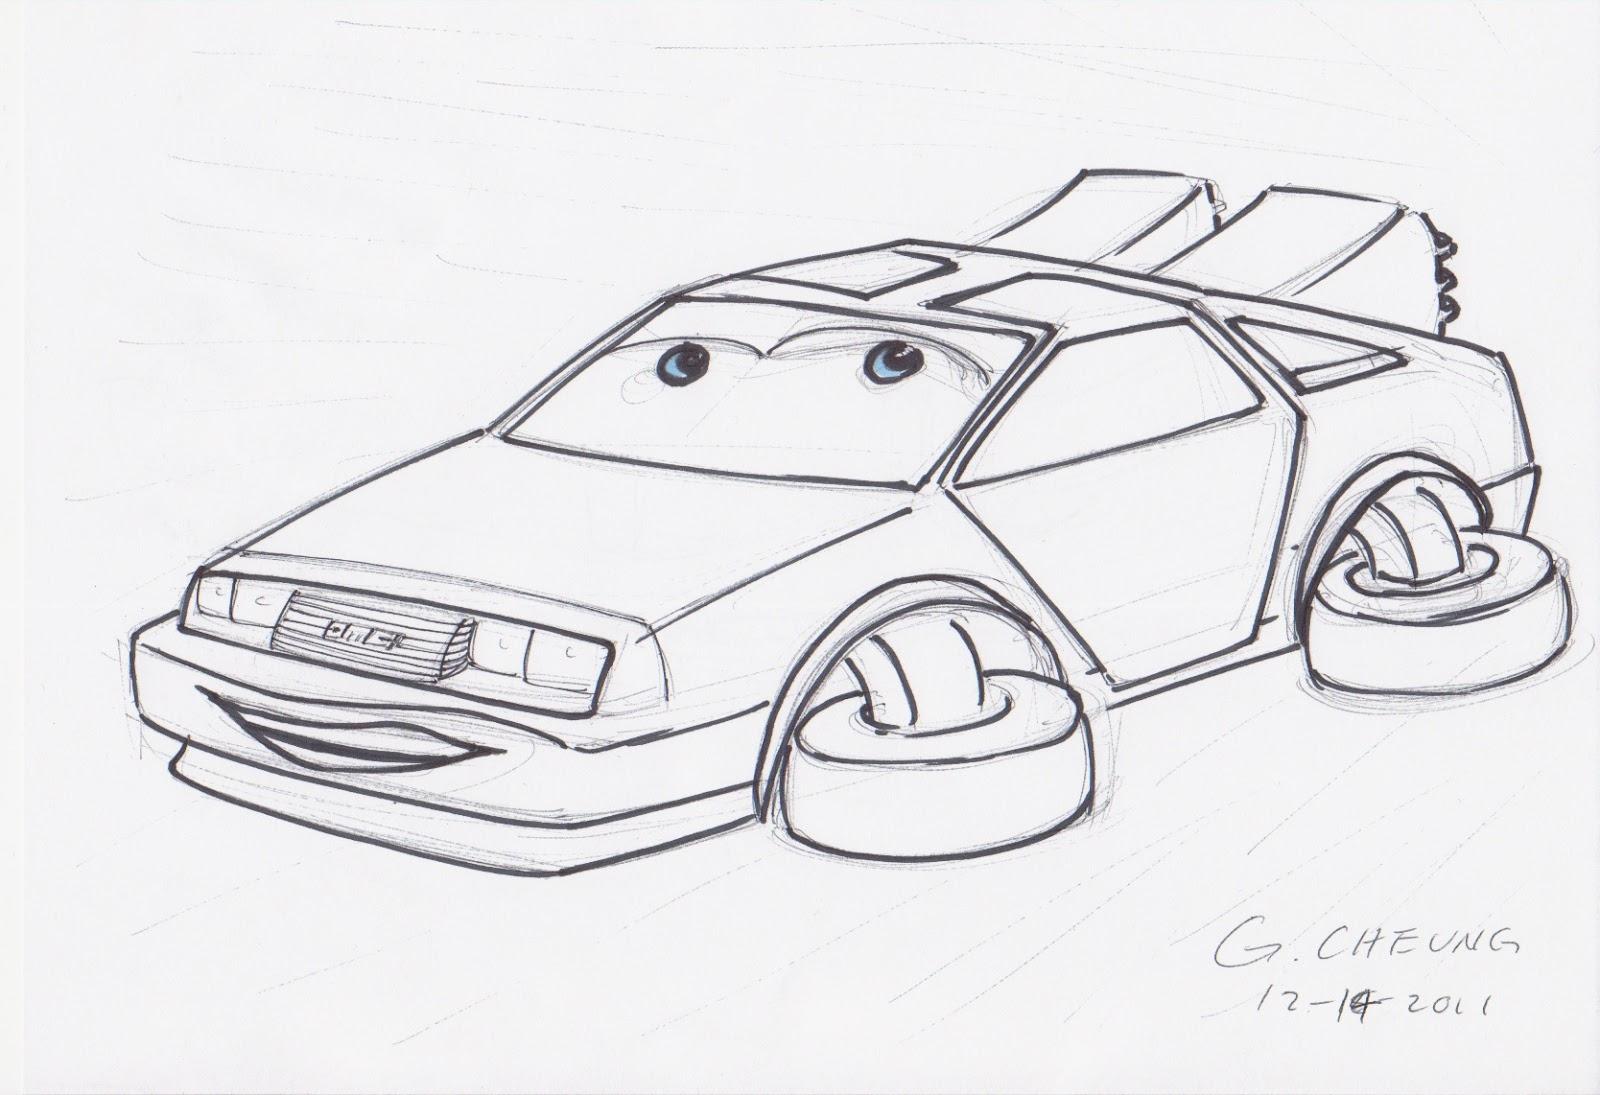 Drawn airplane car #14